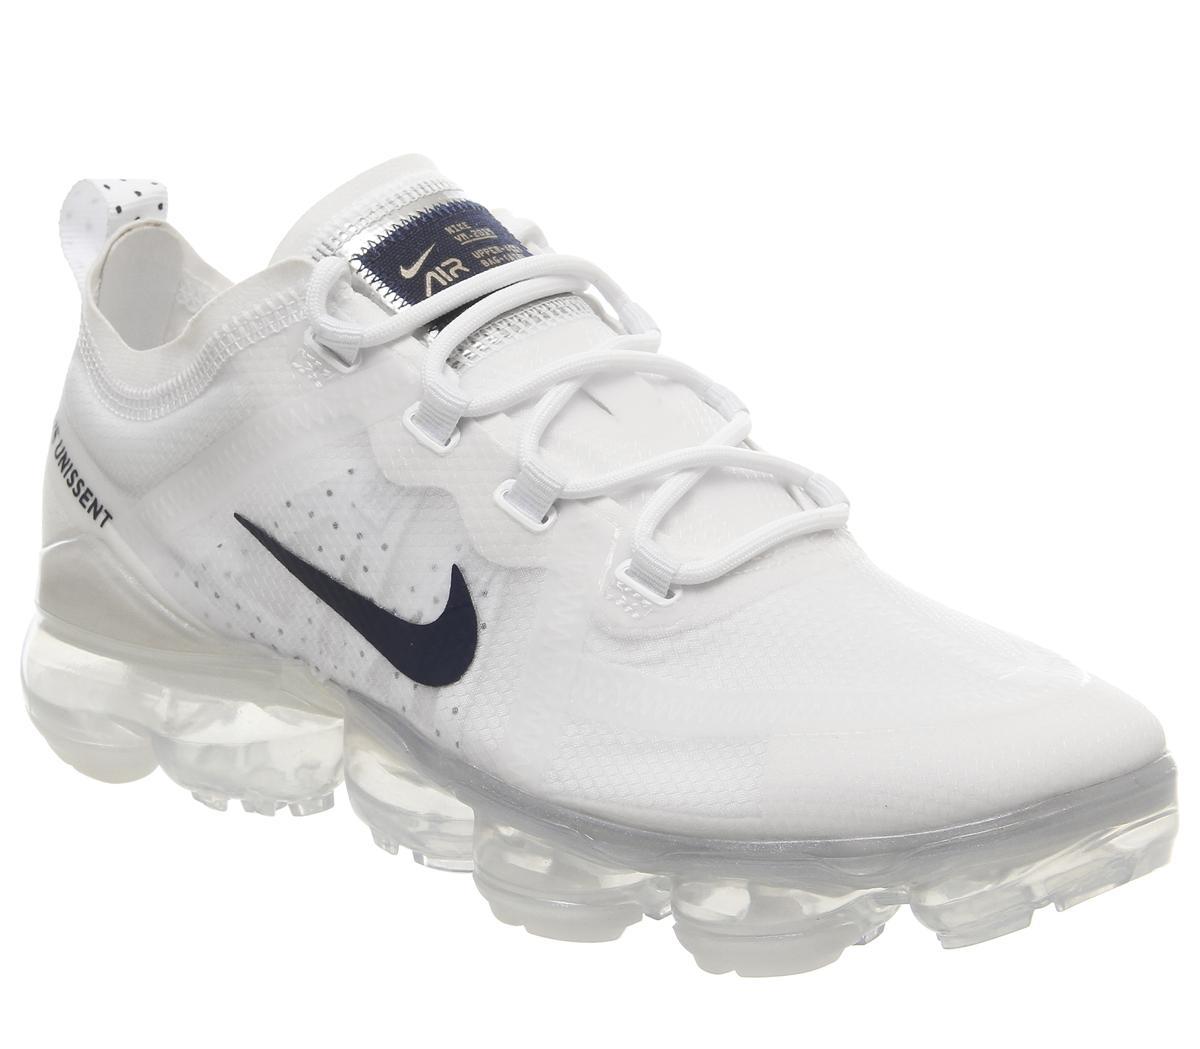 Nike Air Vapormax 2019 Trainers White  fDaEx7